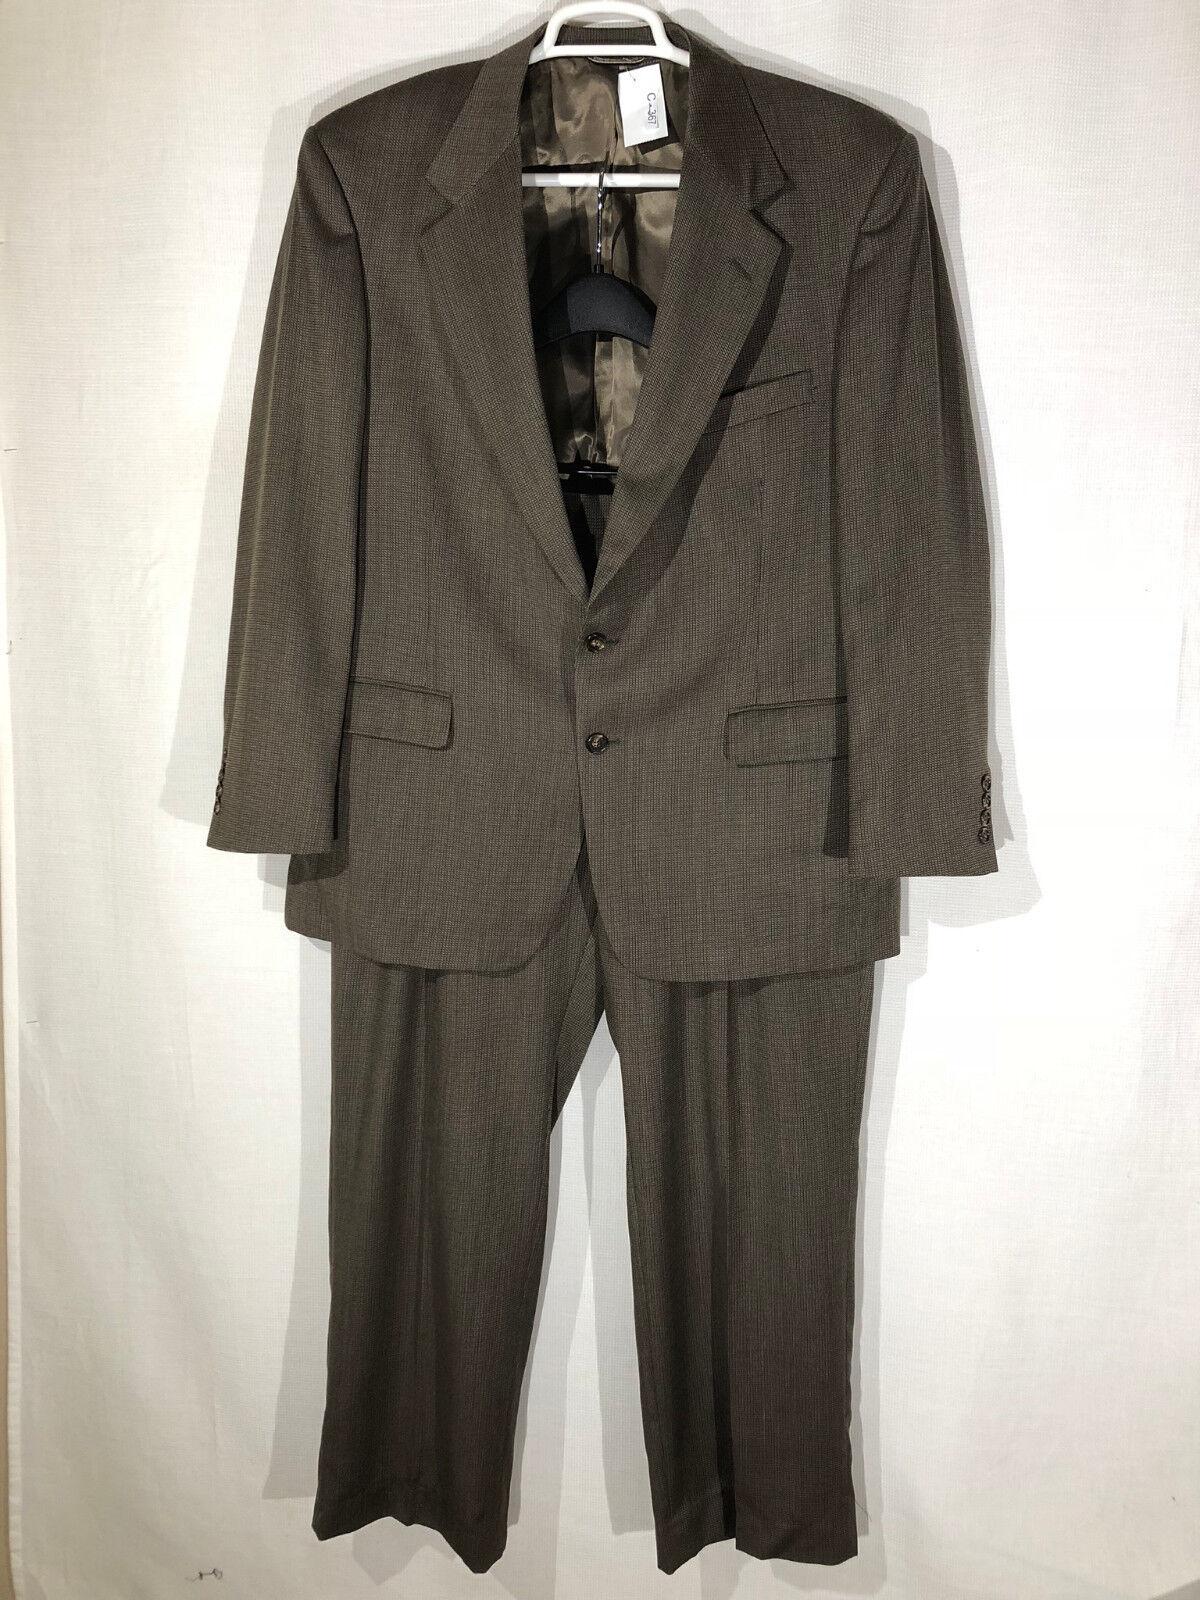 Herren Stafford 44R Braun 2 Button Two Piece Suit Pants 38 x 30